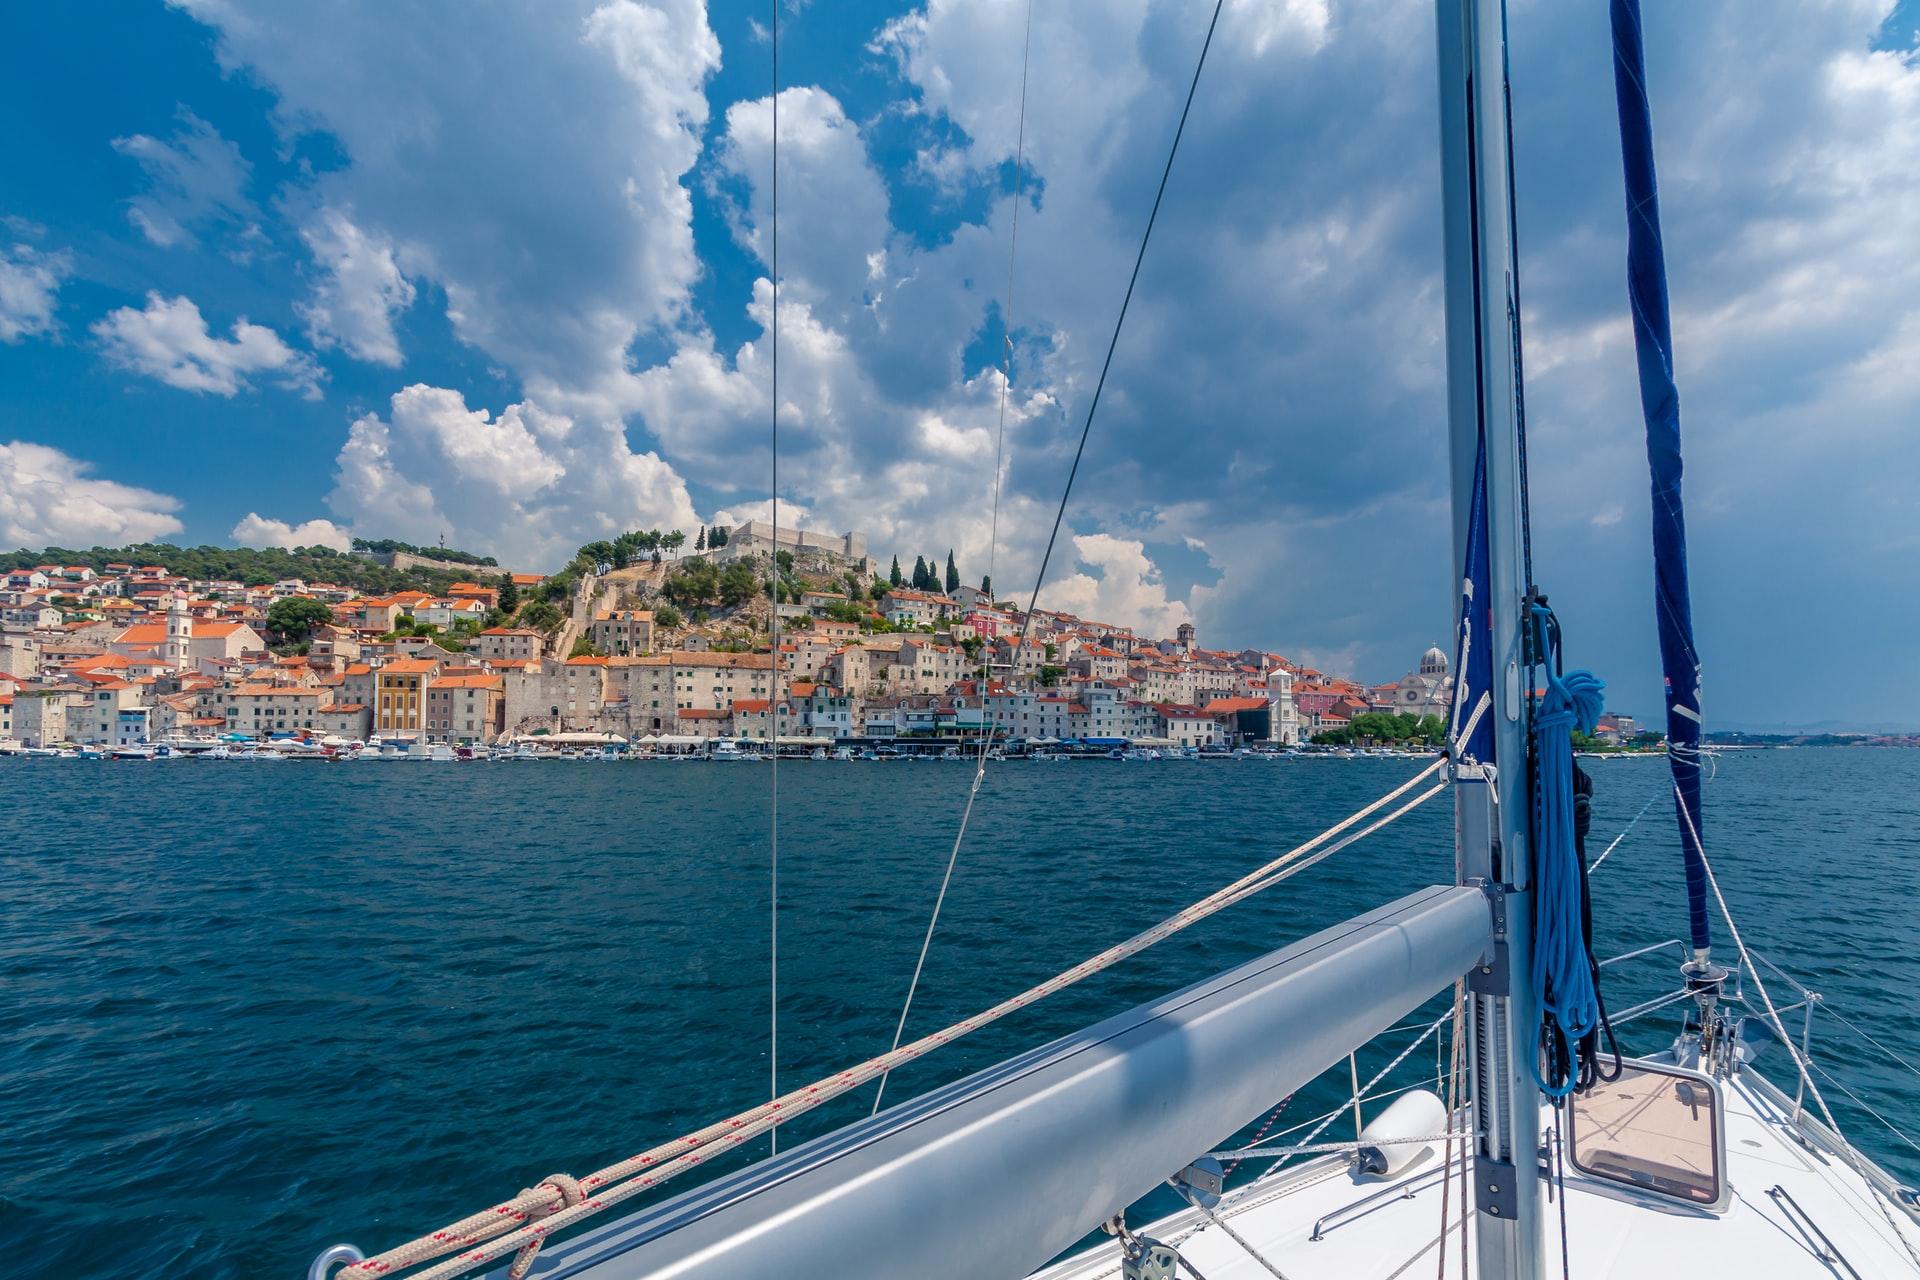 Хорватия, отдых в Хорватии, лето в Хорватии